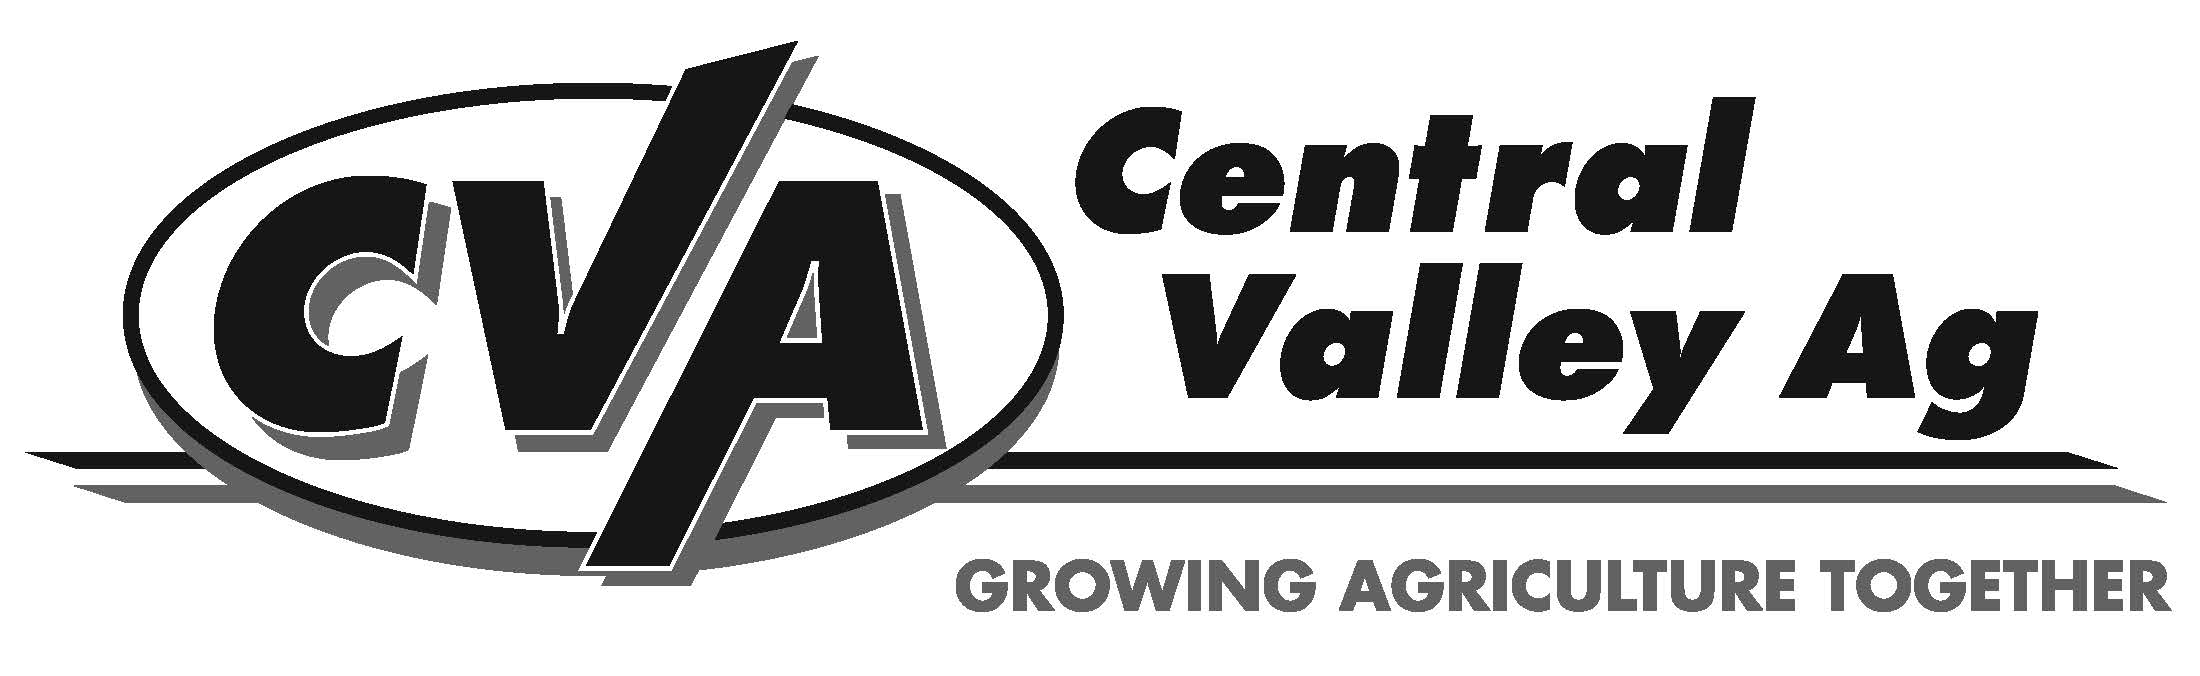 Central Valley Ag logo